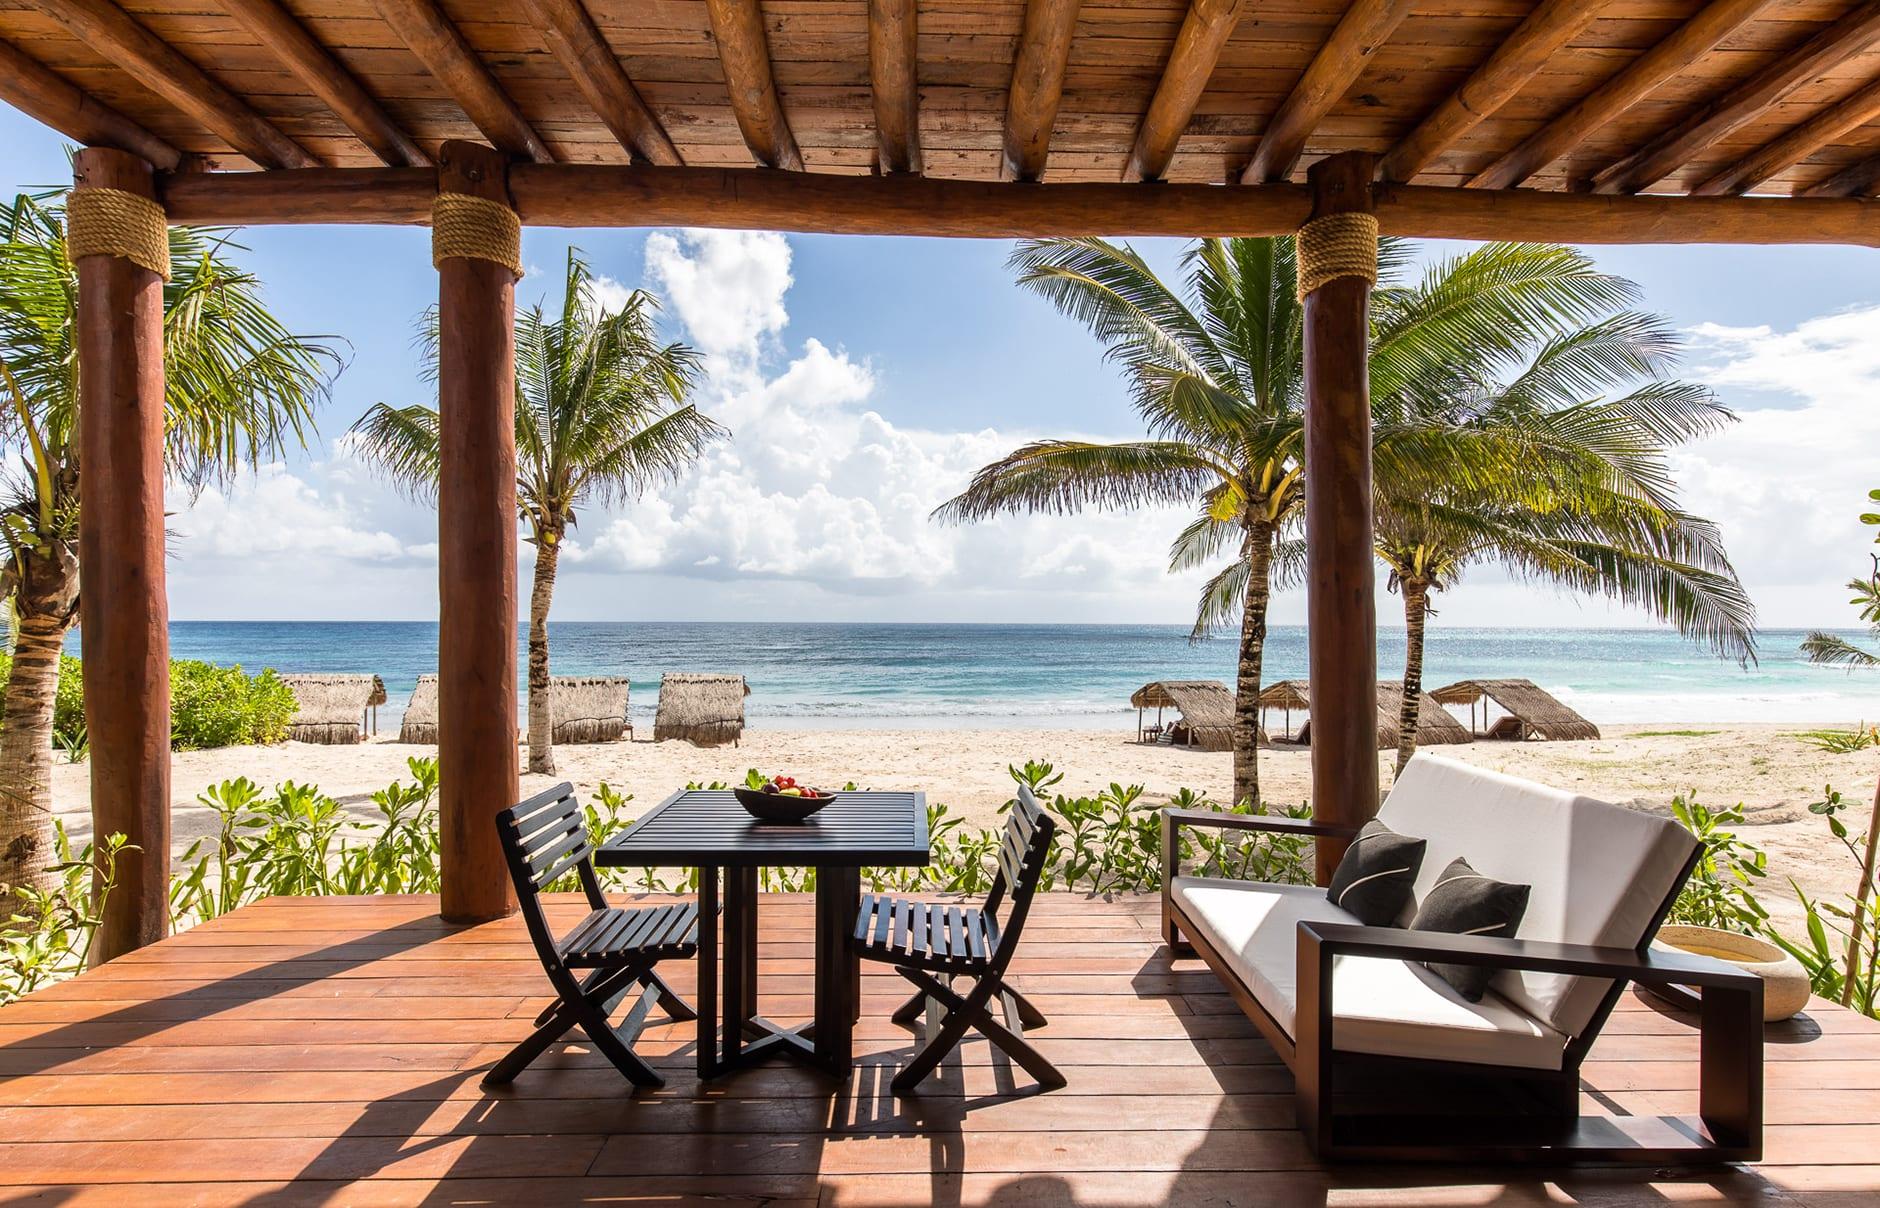 Hotel Esencia, Xpu Ha, Mexico. Luxury Hotel Review by TravelPlusStyle. Photo © Hotel Esencia